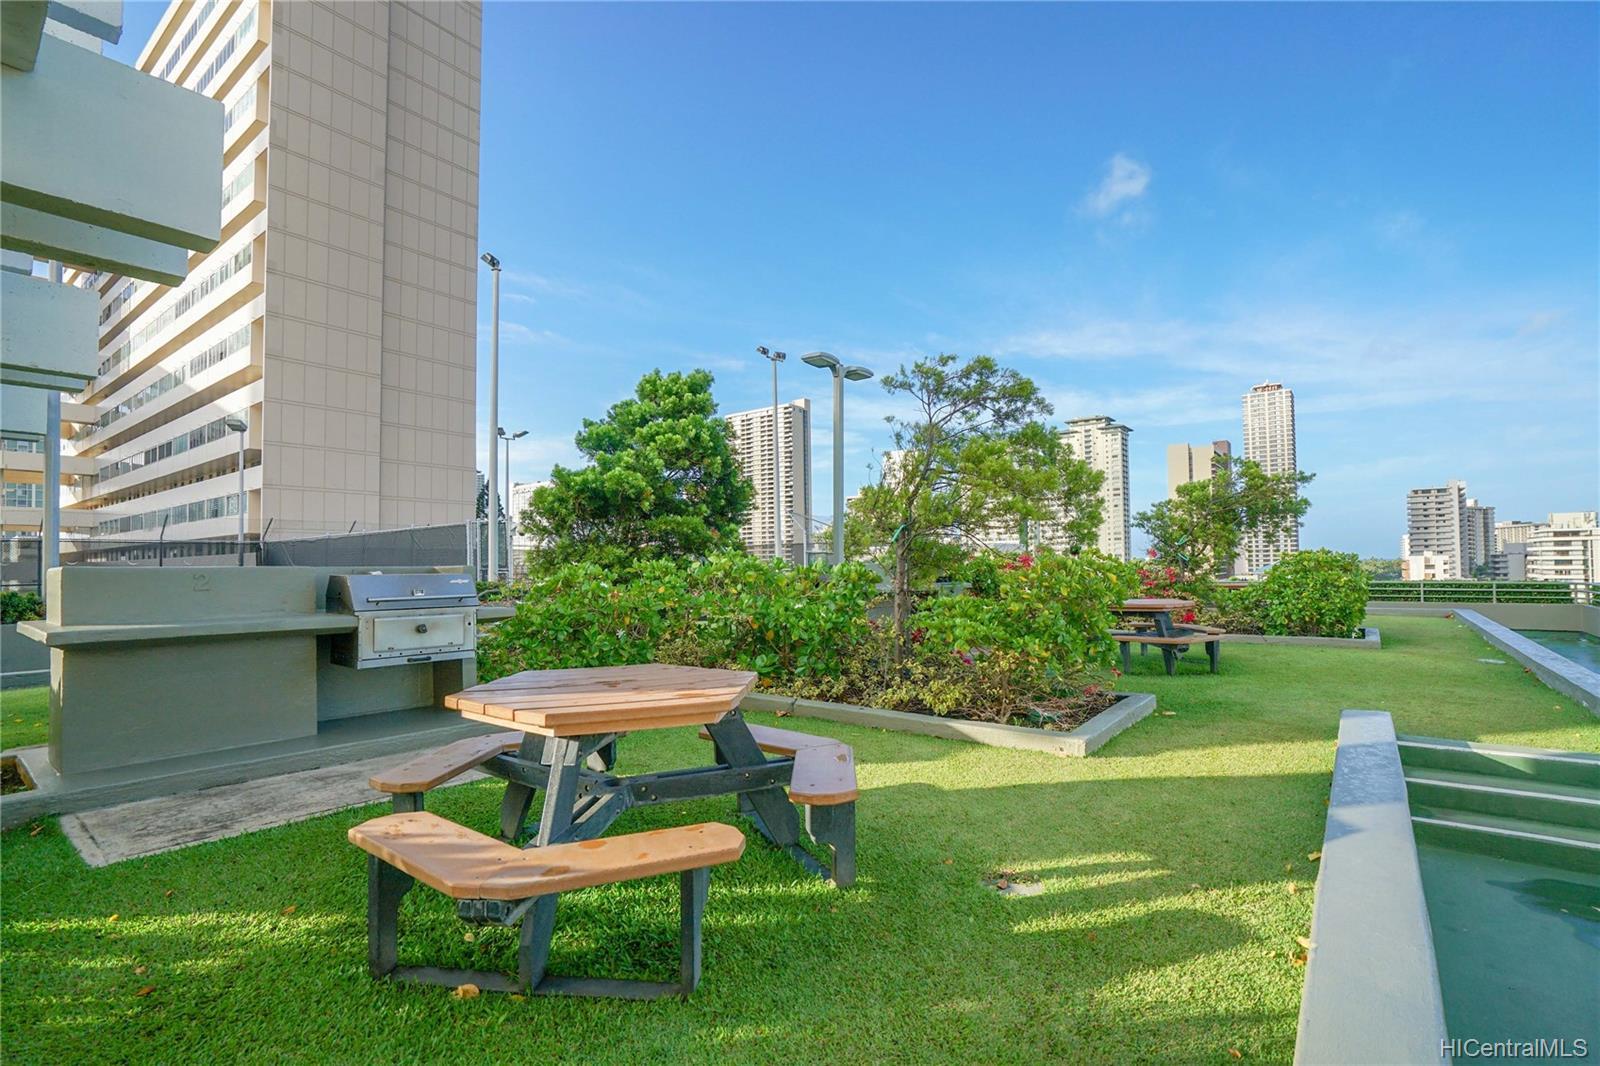 MARCO POLO APTS condo # 2909, Honolulu, Hawaii - photo 21 of 25